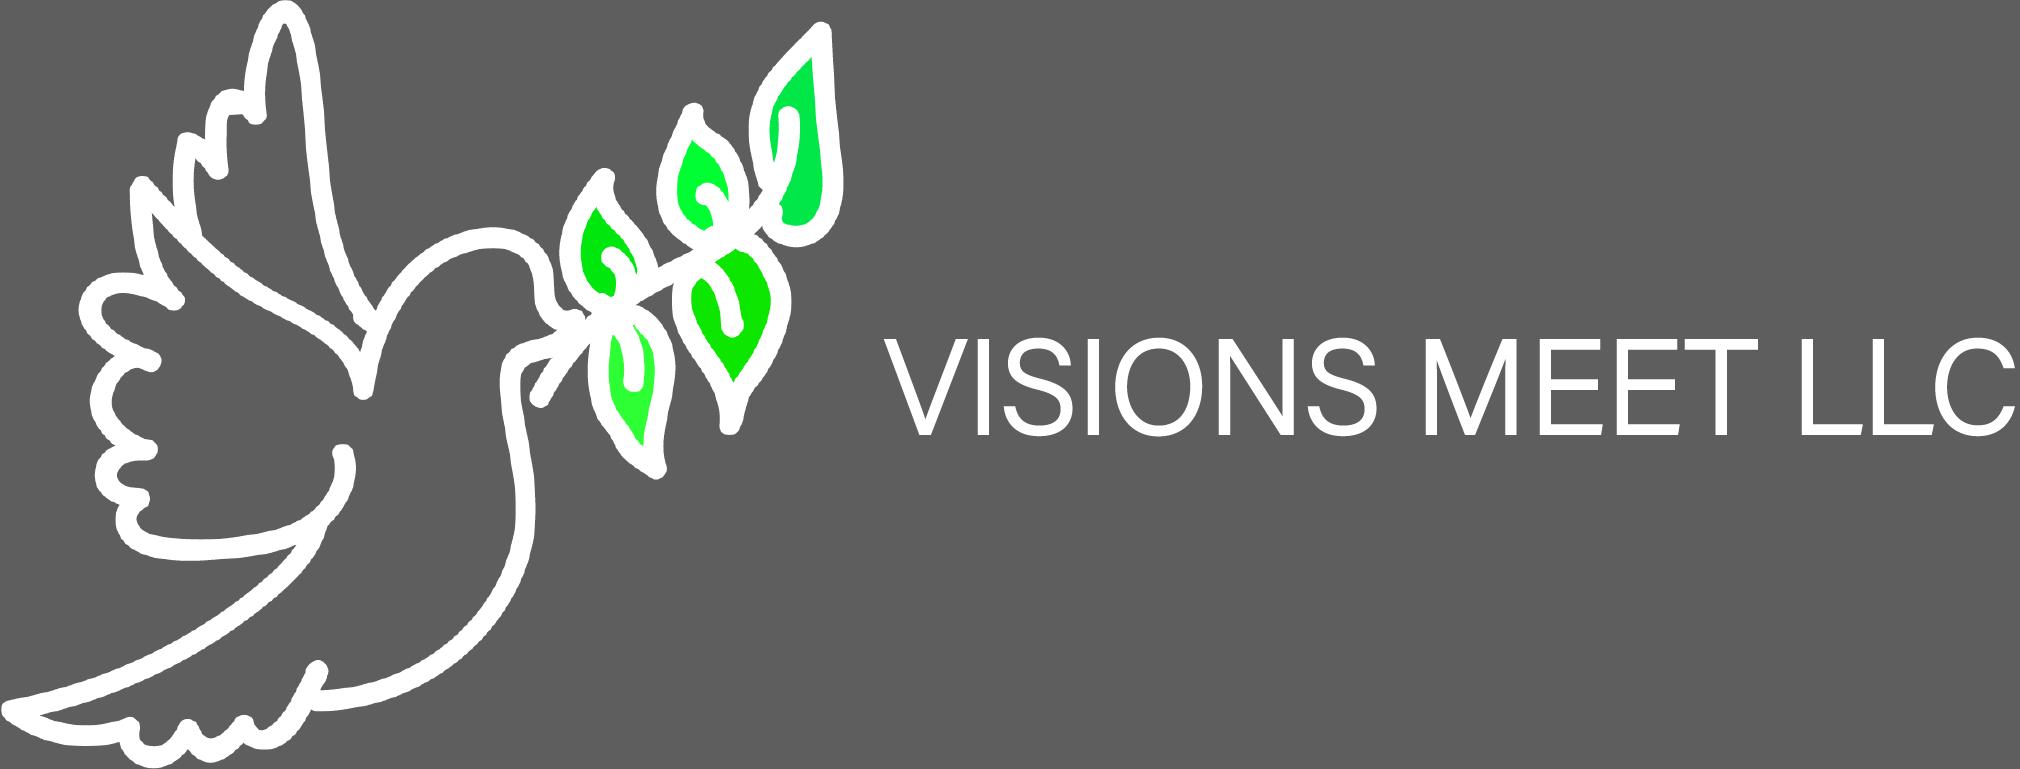 visionsmeetlogo_orig gray backdrop